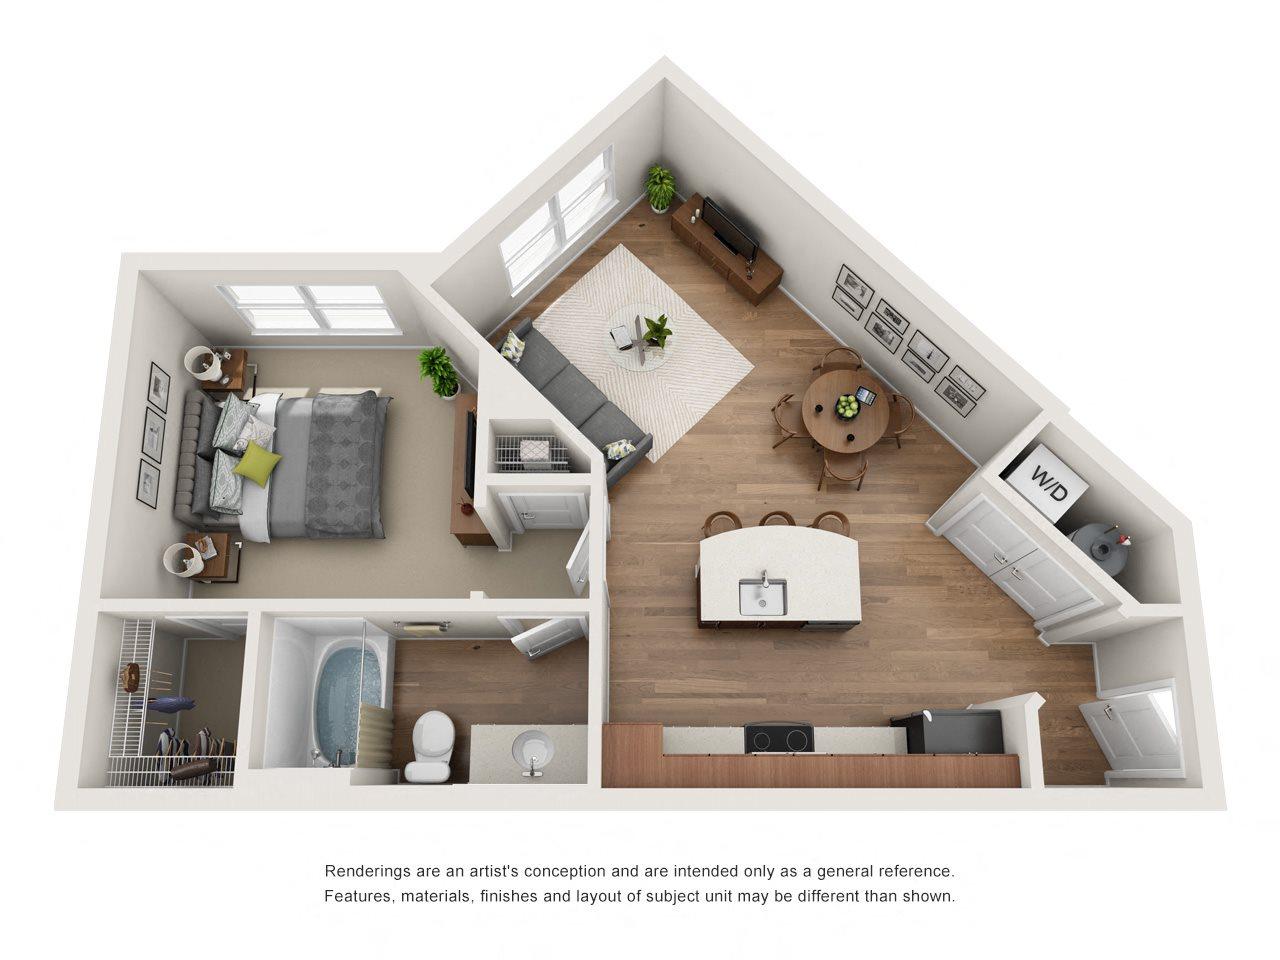 floor plans of river house apartments in baton rouge la